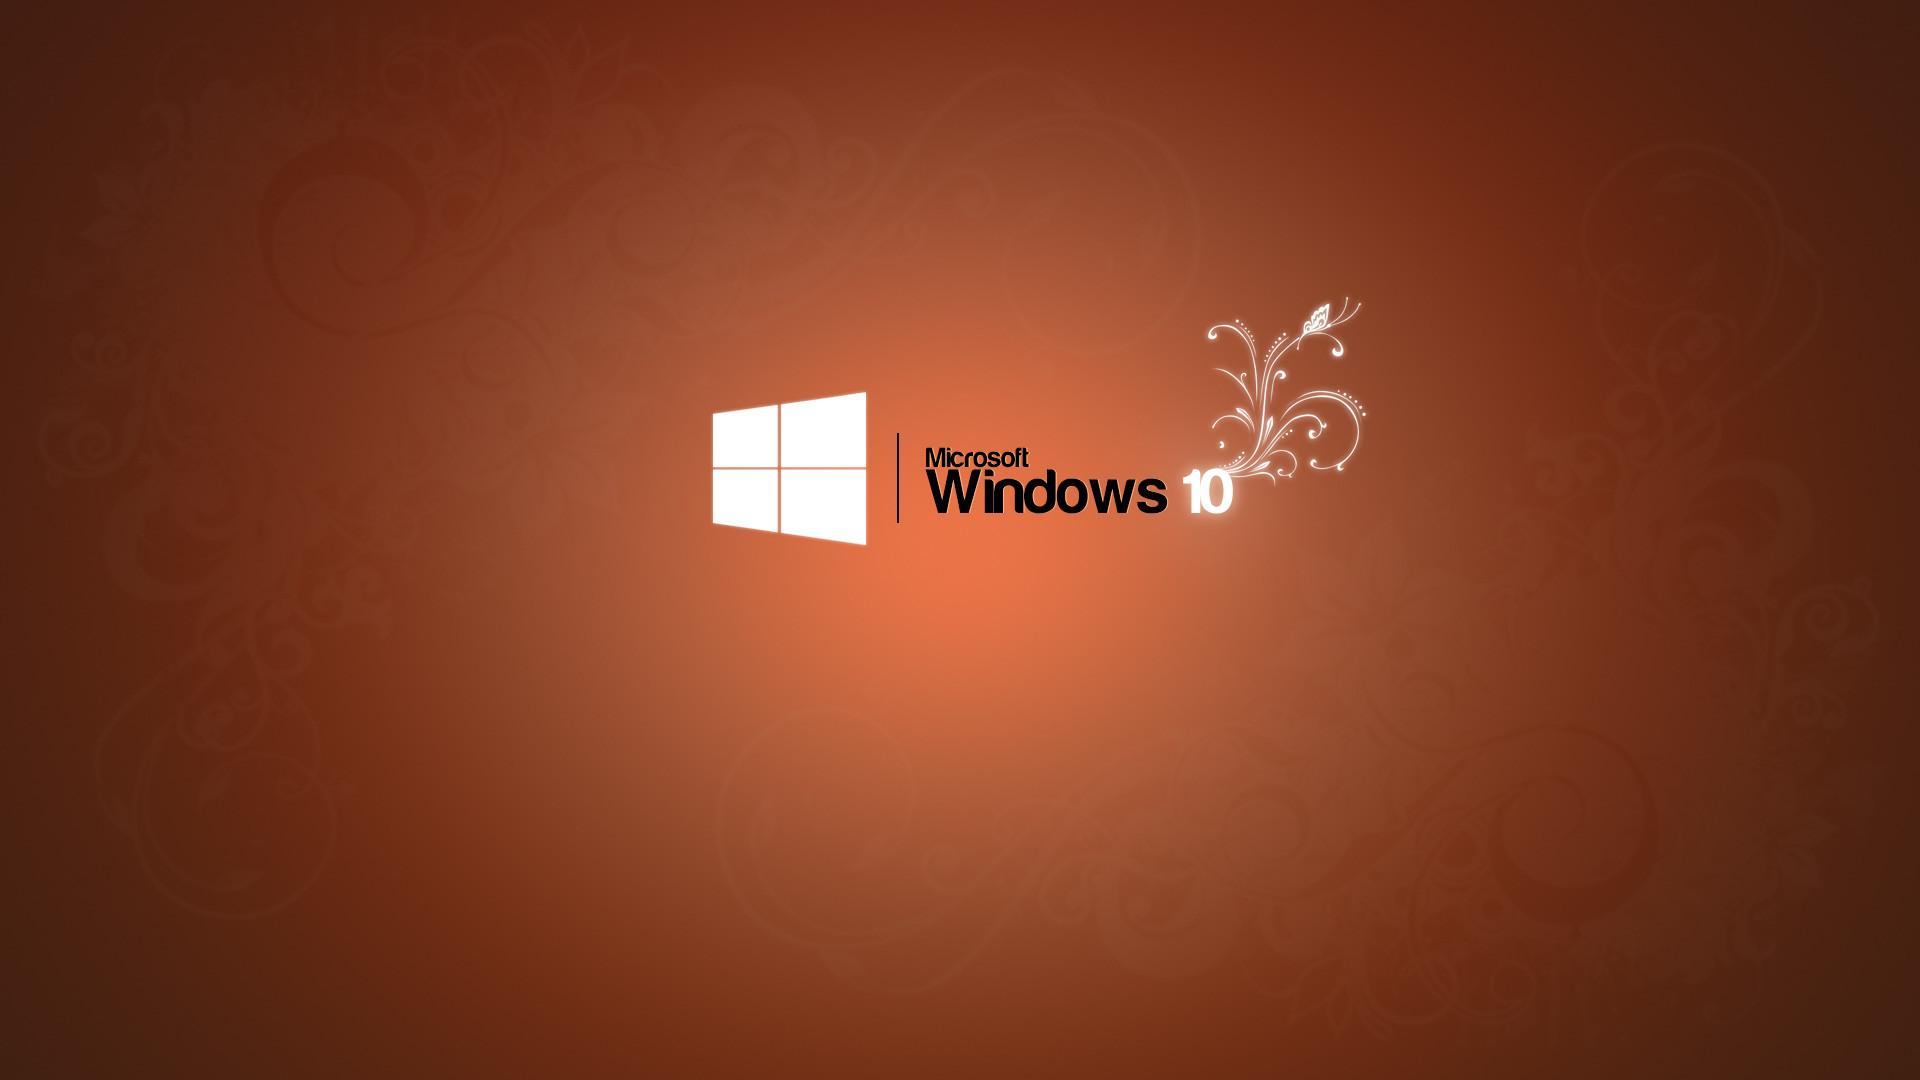 Free Wallpapers – Windows 10 wallpaper